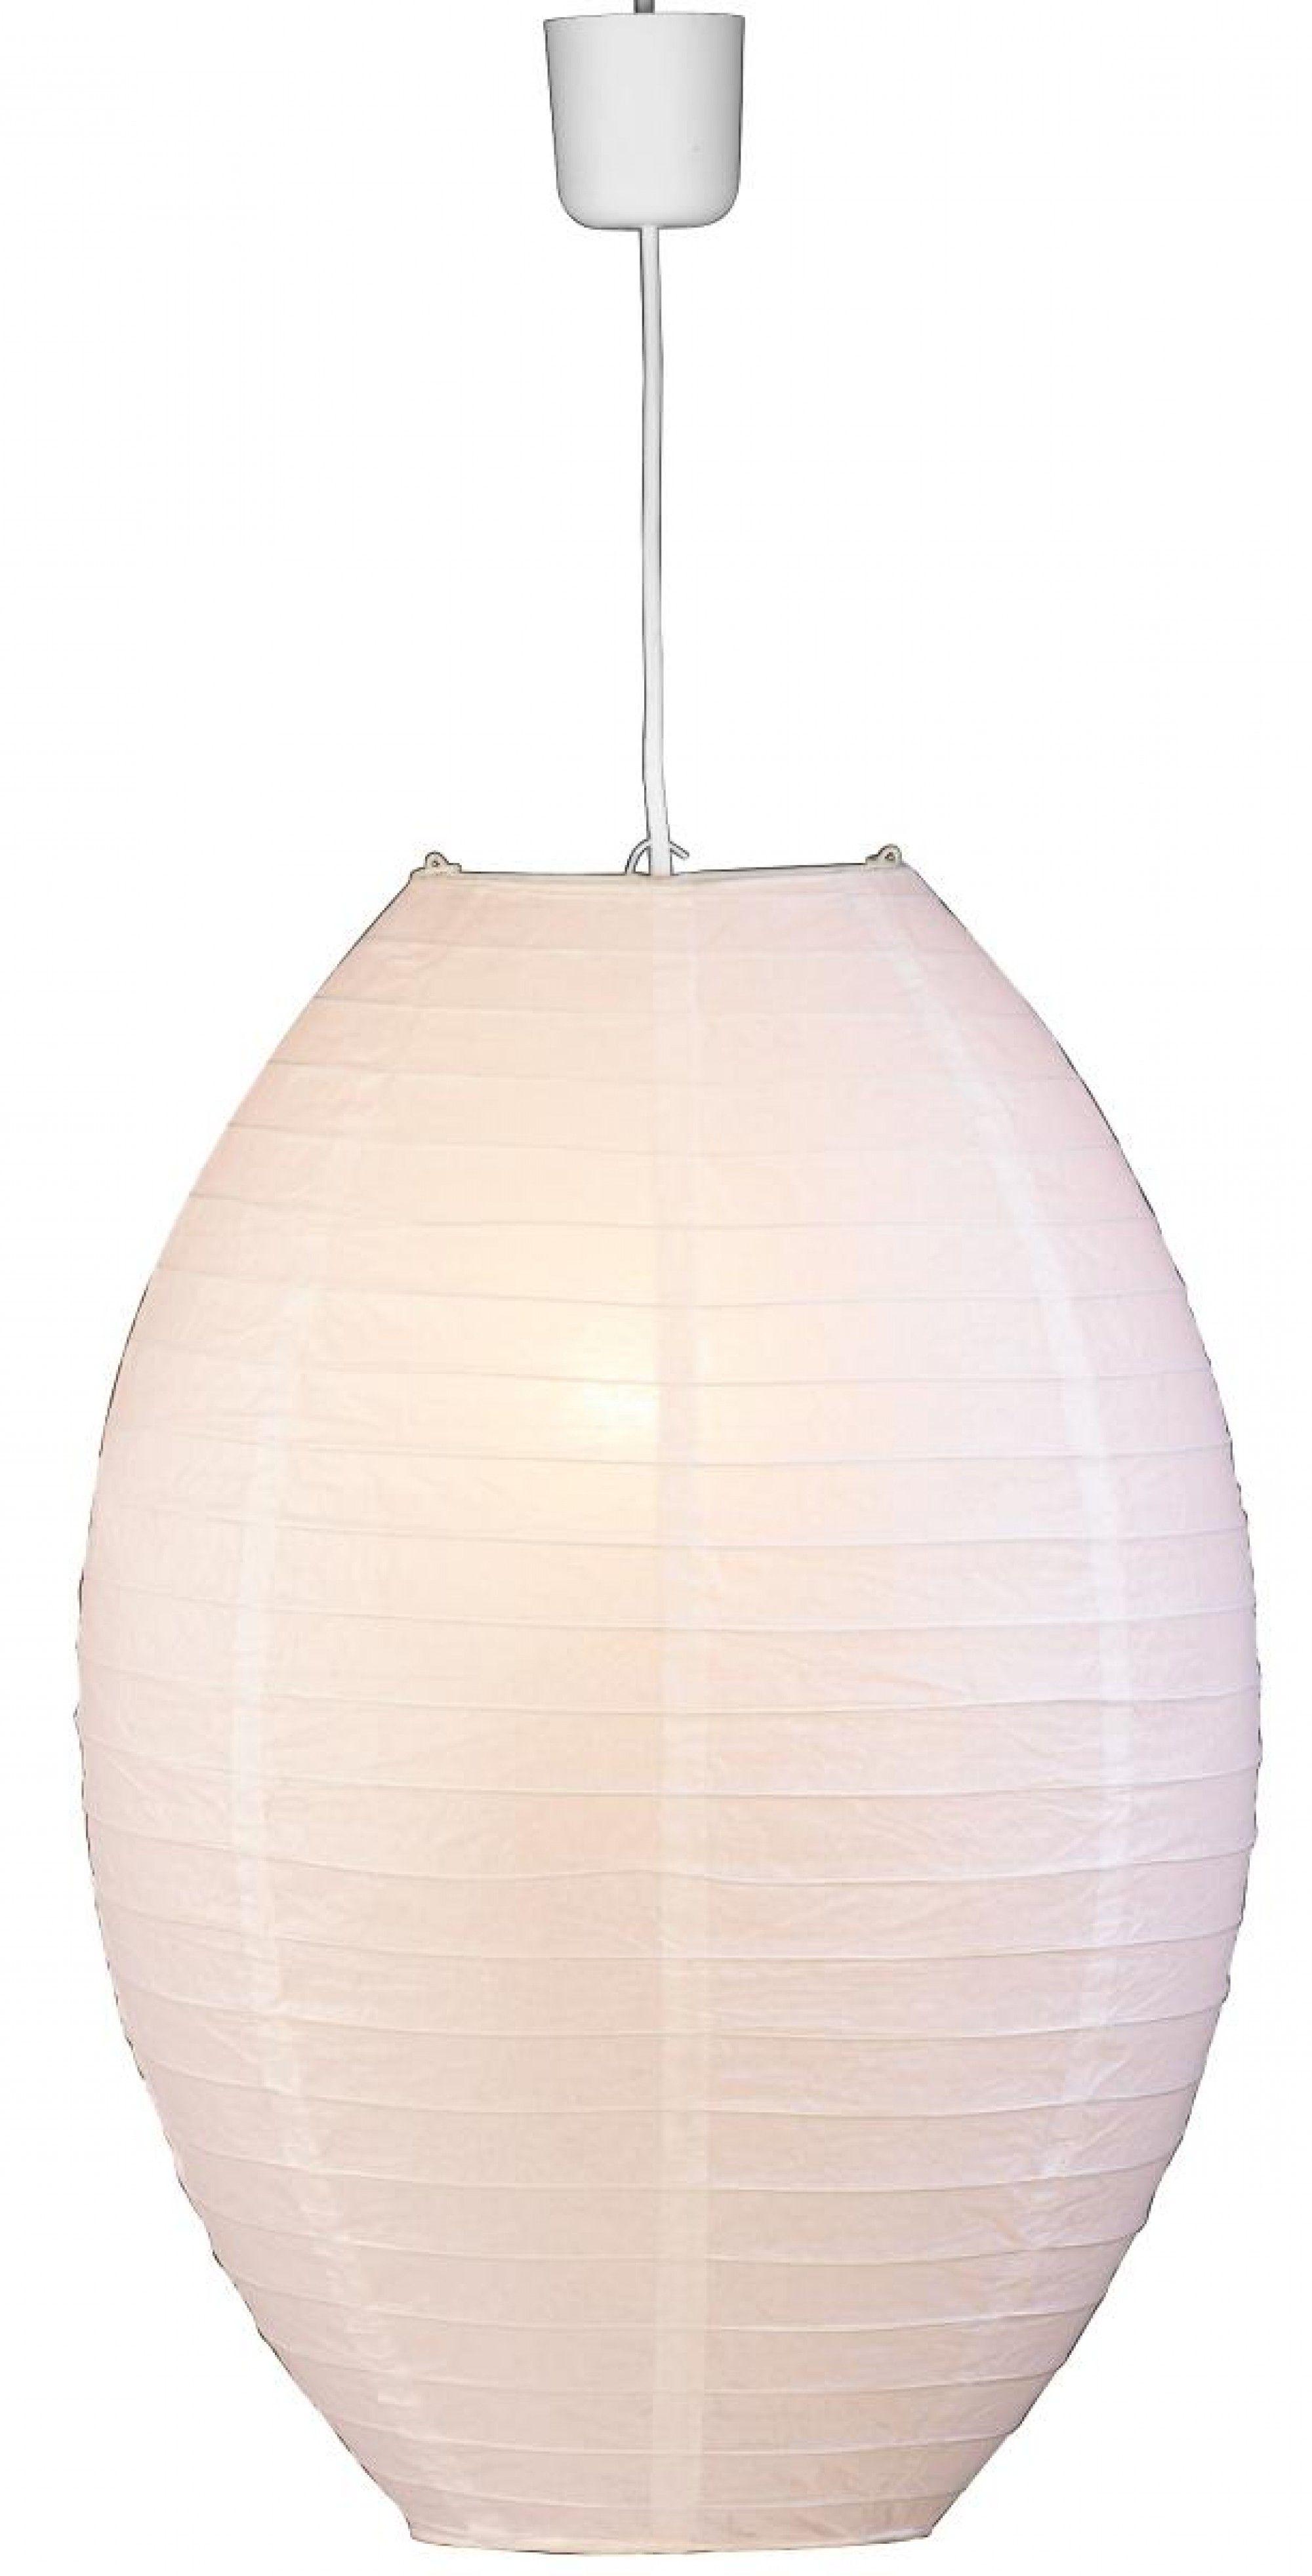 Leuchten Online Design Lampen Maurer